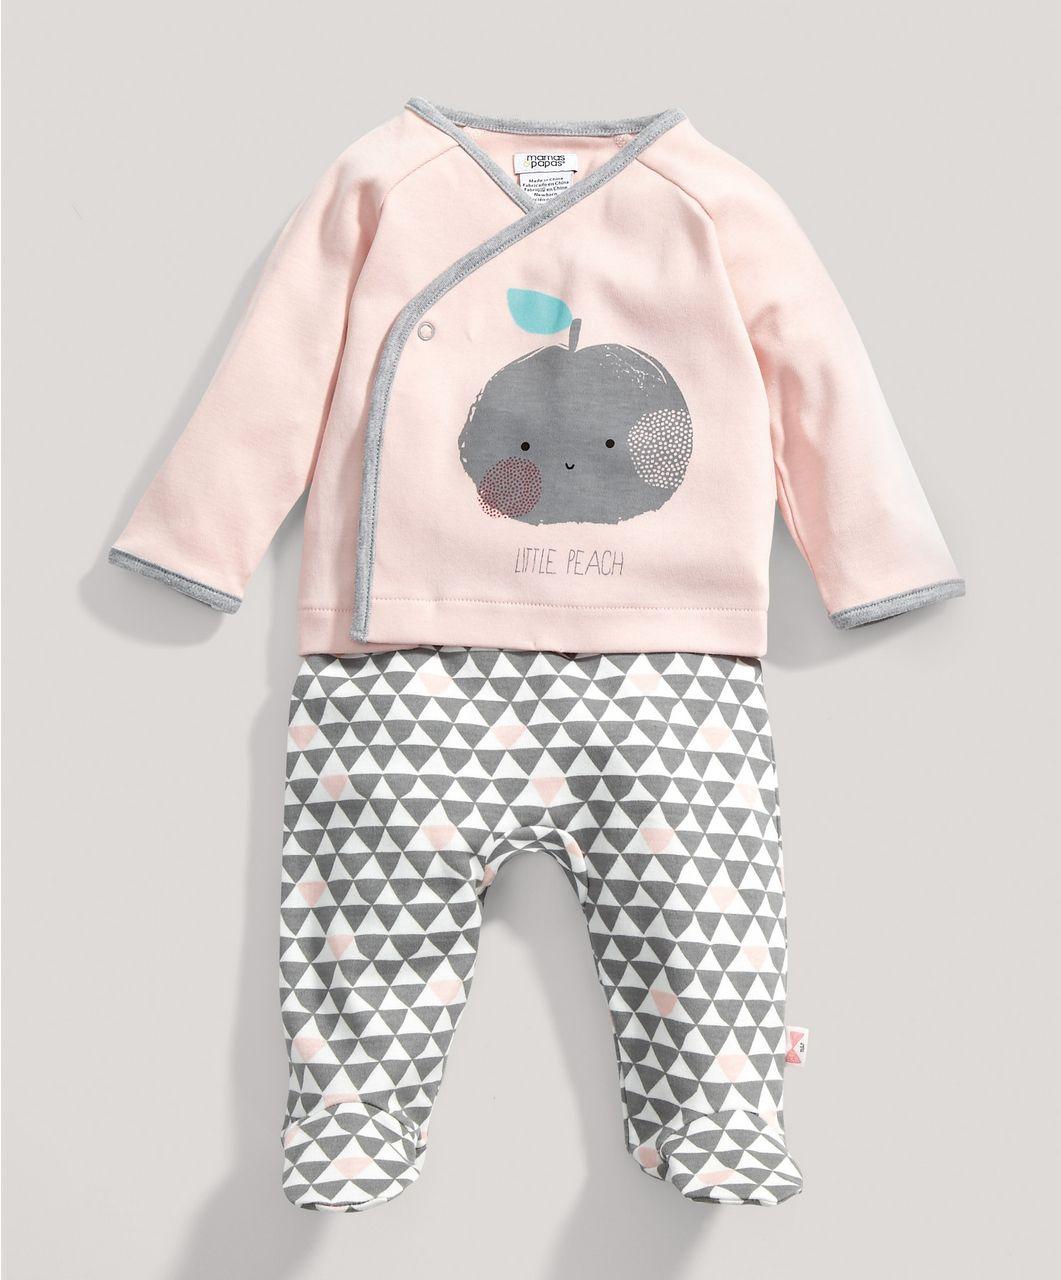 Mamas And Papas 3-6 Months Girls Baby & Toddler Clothing Girls' Clothing (newborn-5t)